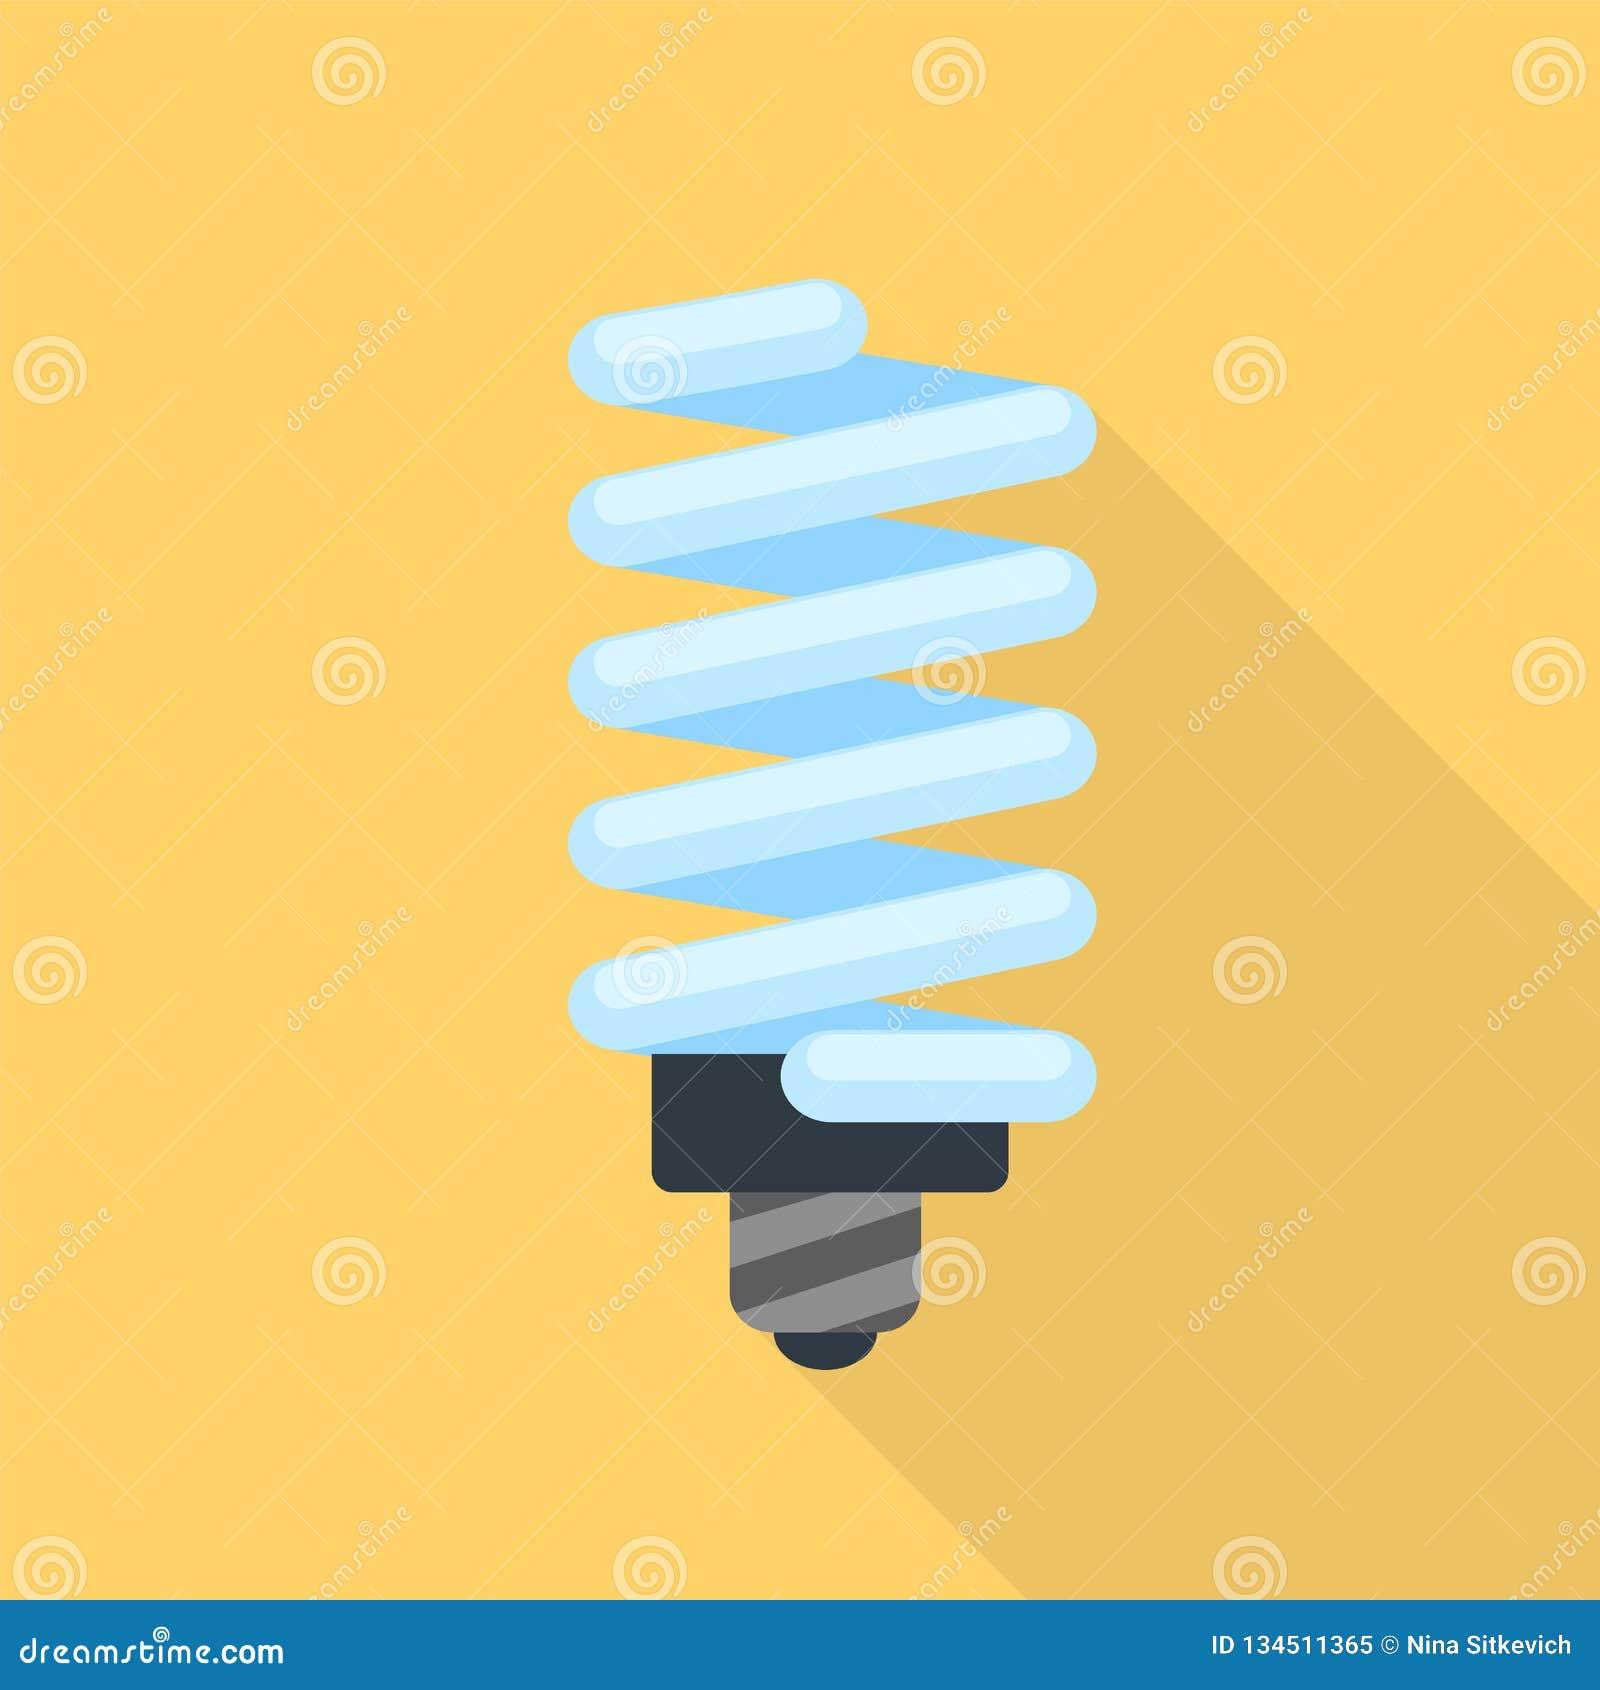 Energy saving bulb icon, flat style